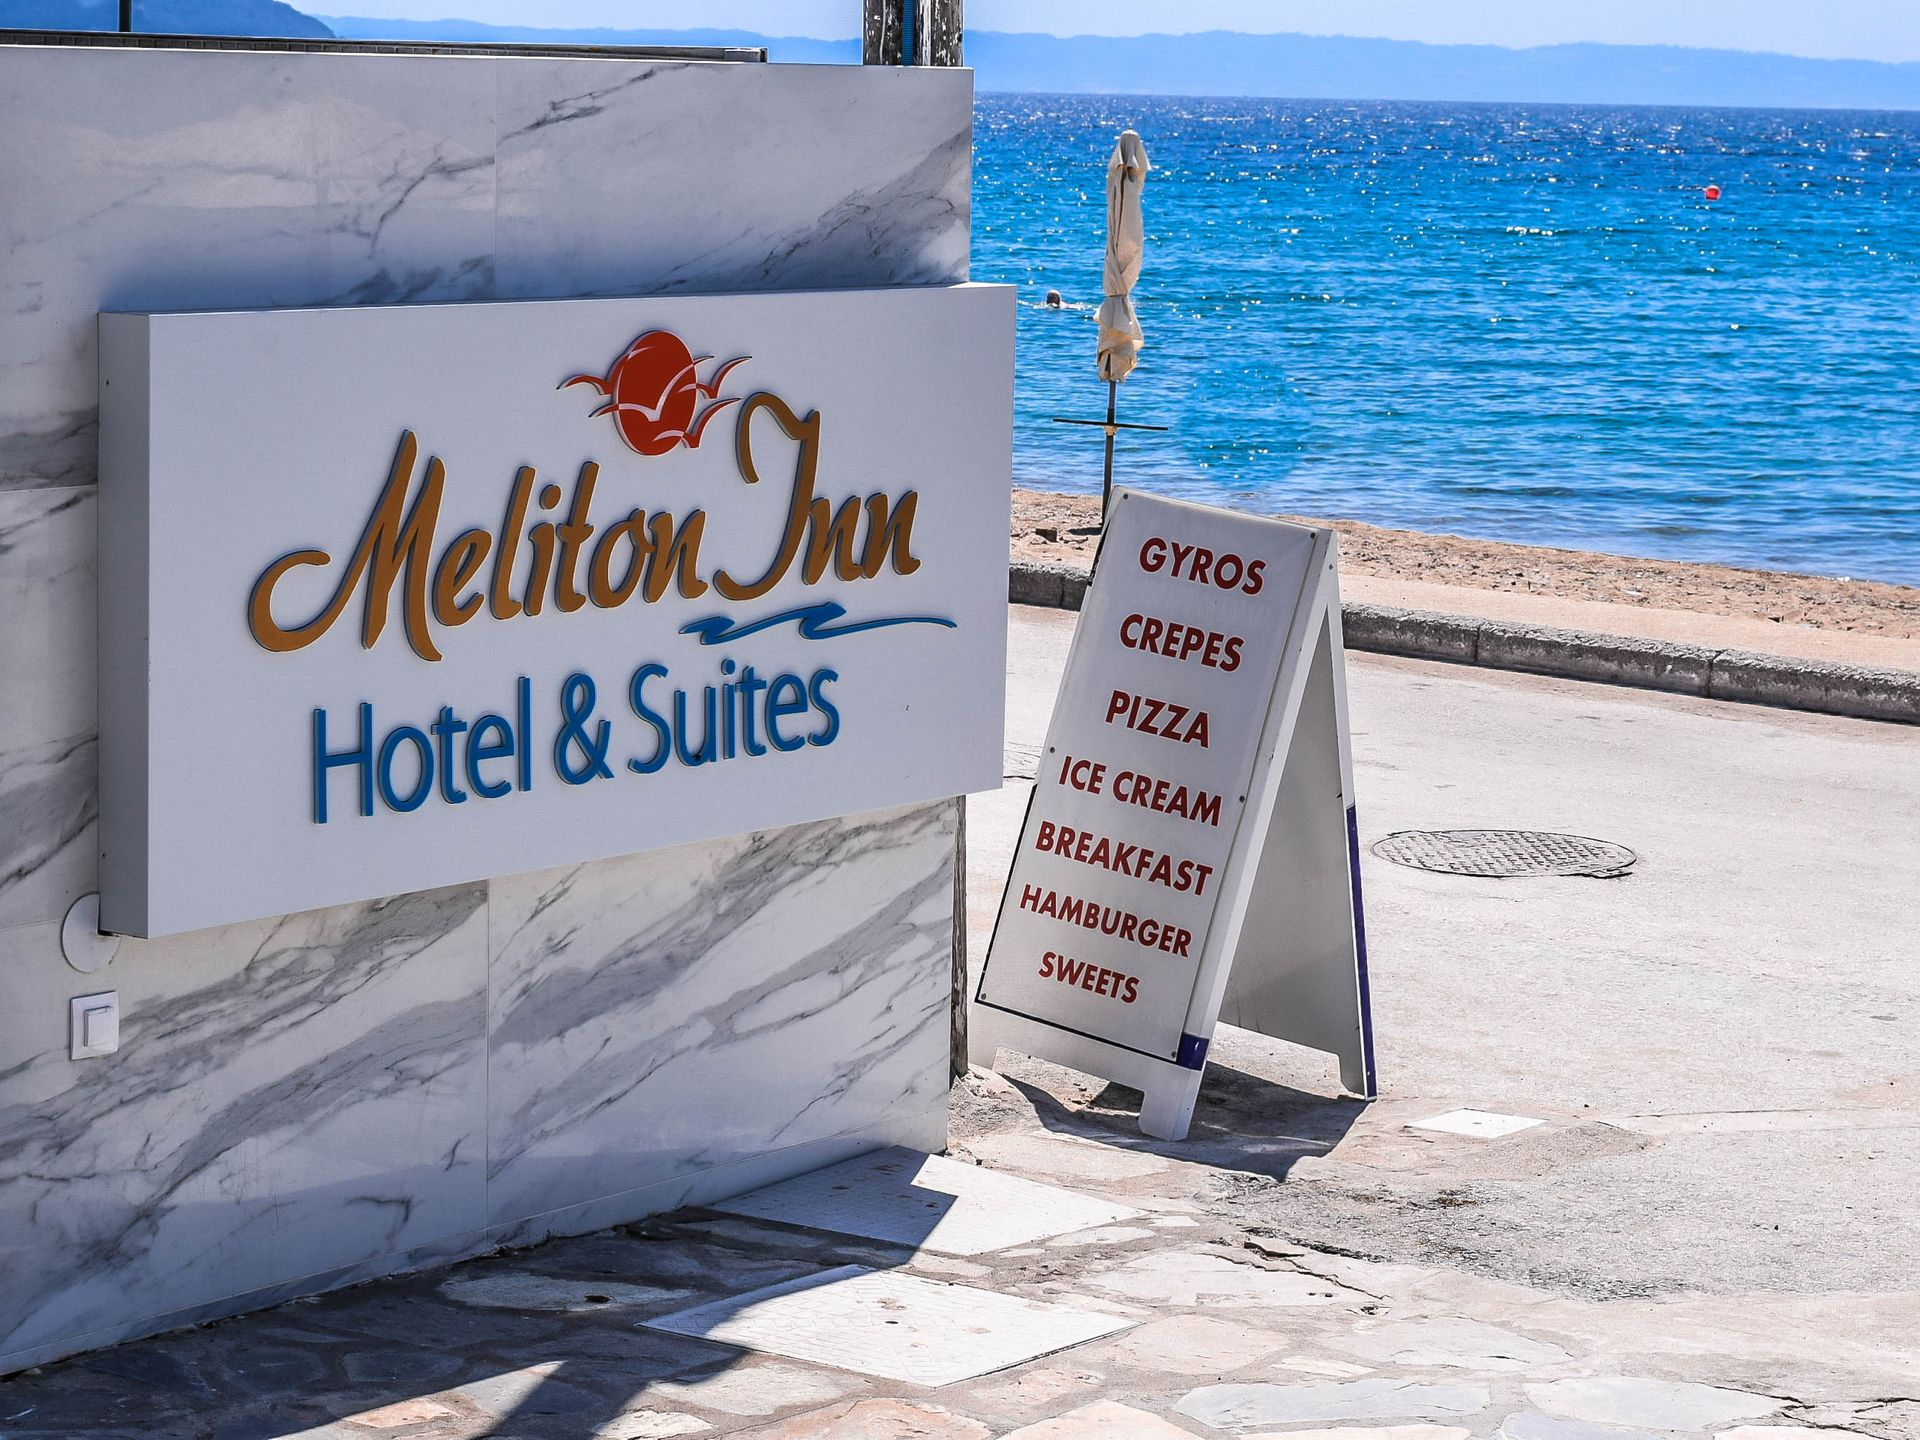 Meliton Inn Hotel & Suites Chalkidiki